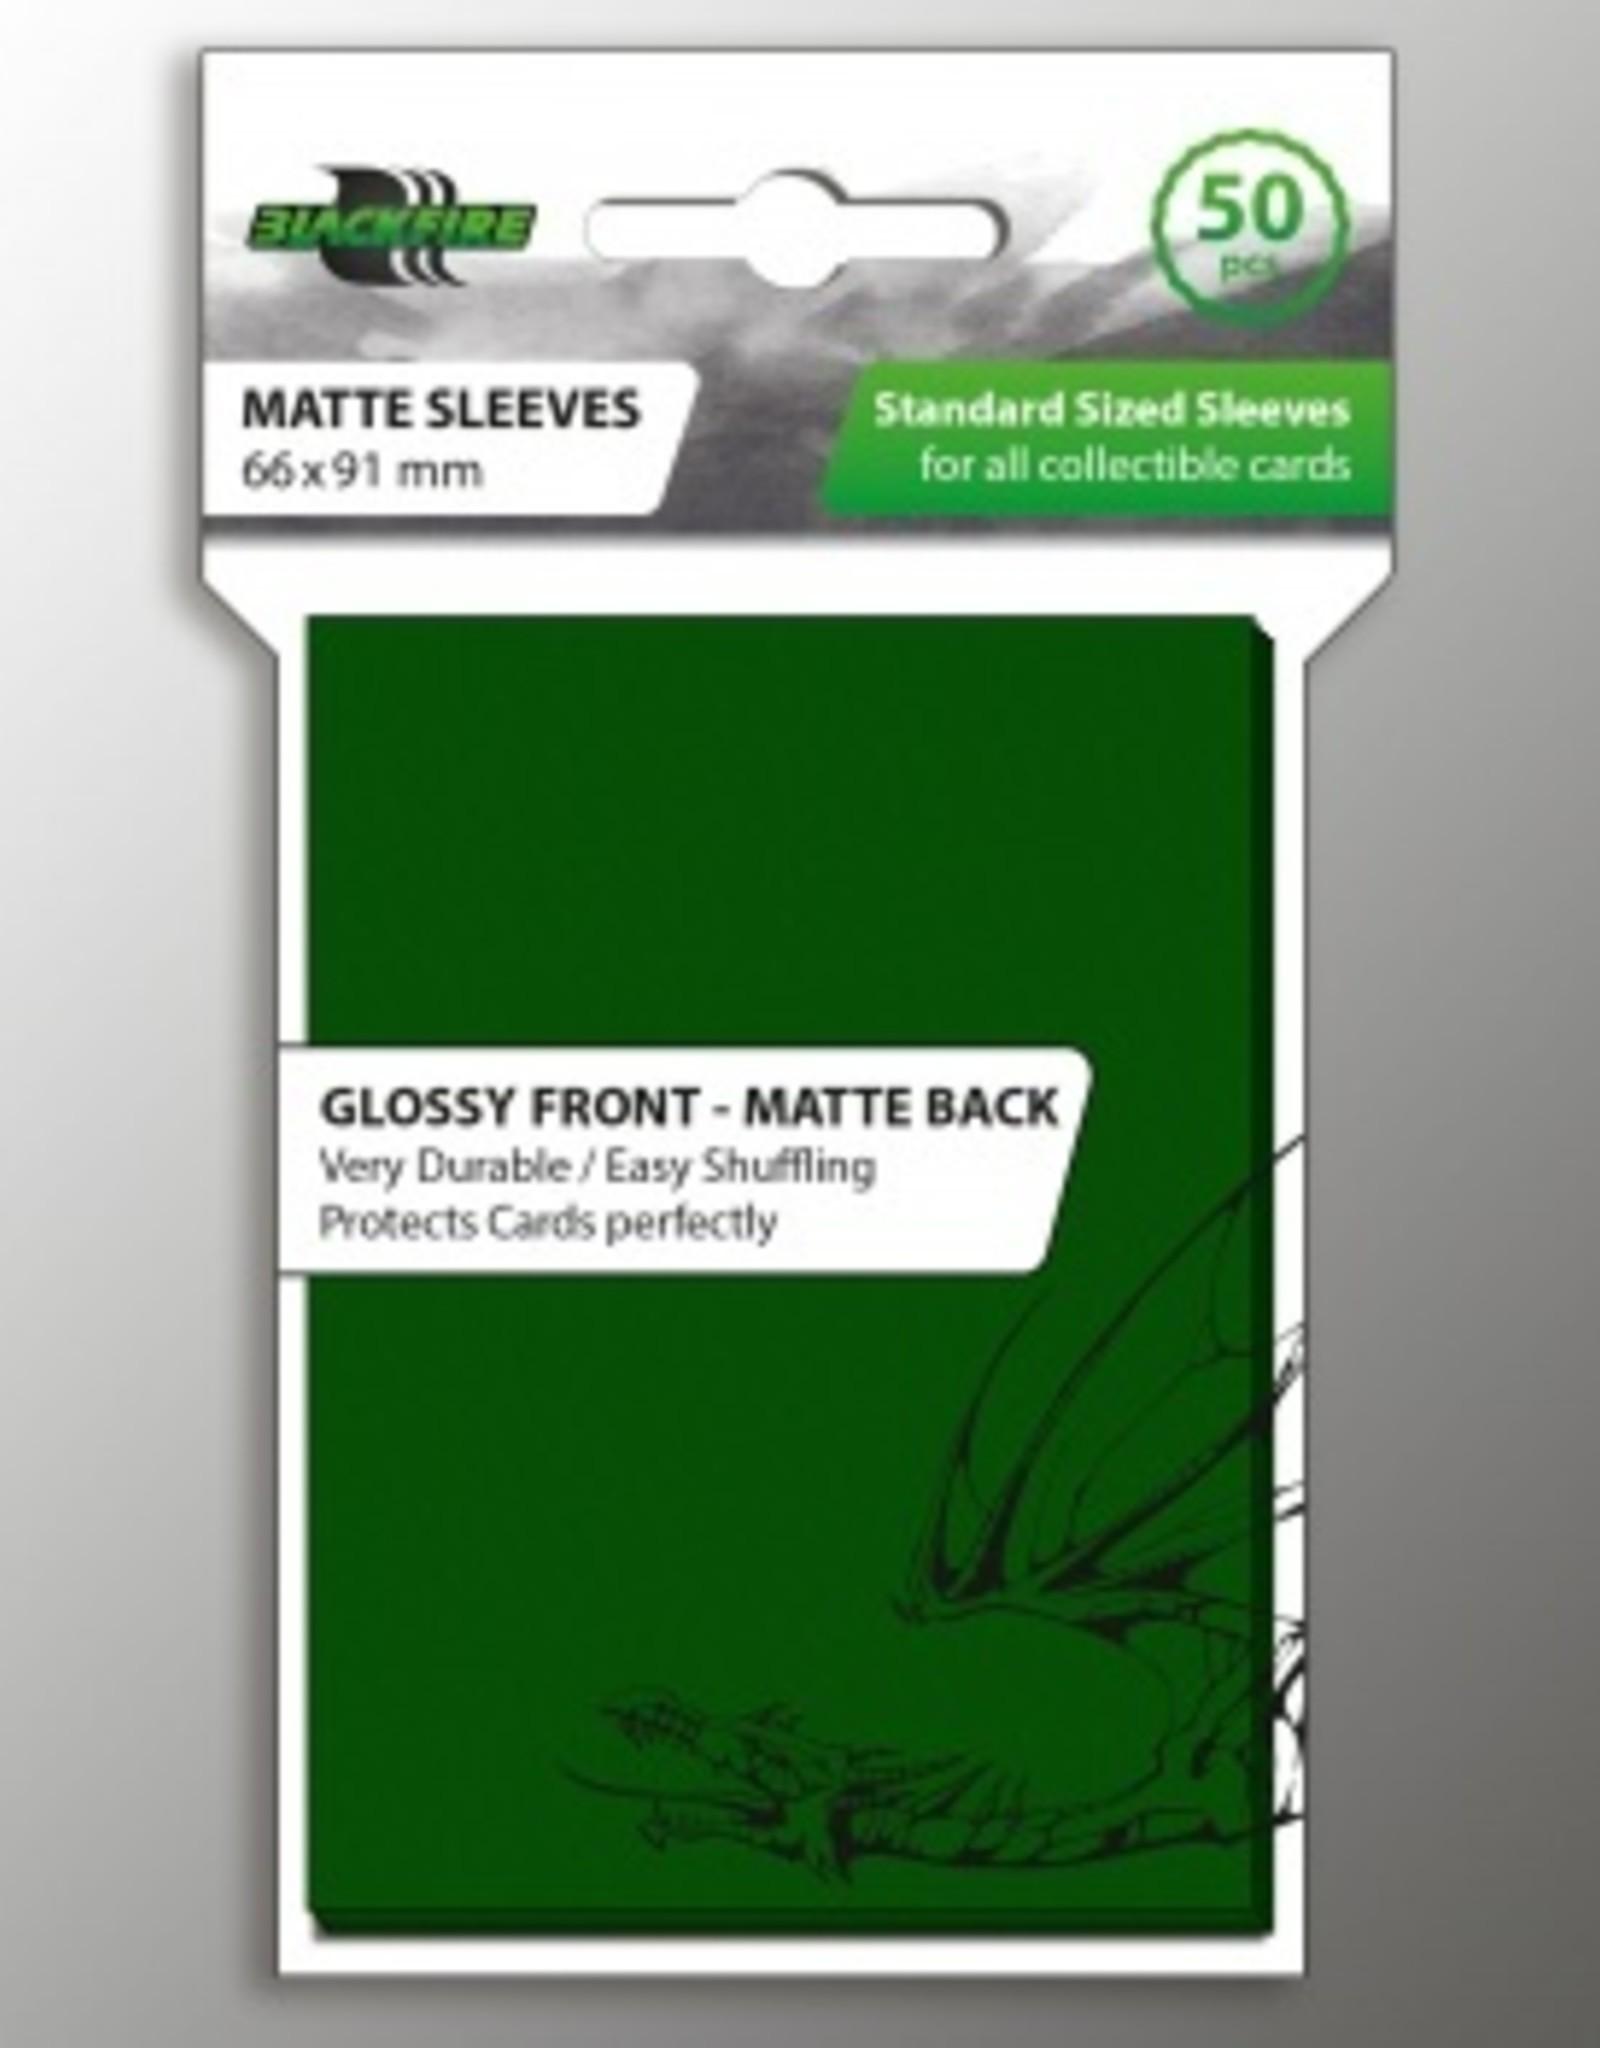 ADC Blackfire Blackfire Sleeves Standard Glossy Front Matte Back Green (50) (66x91mm)